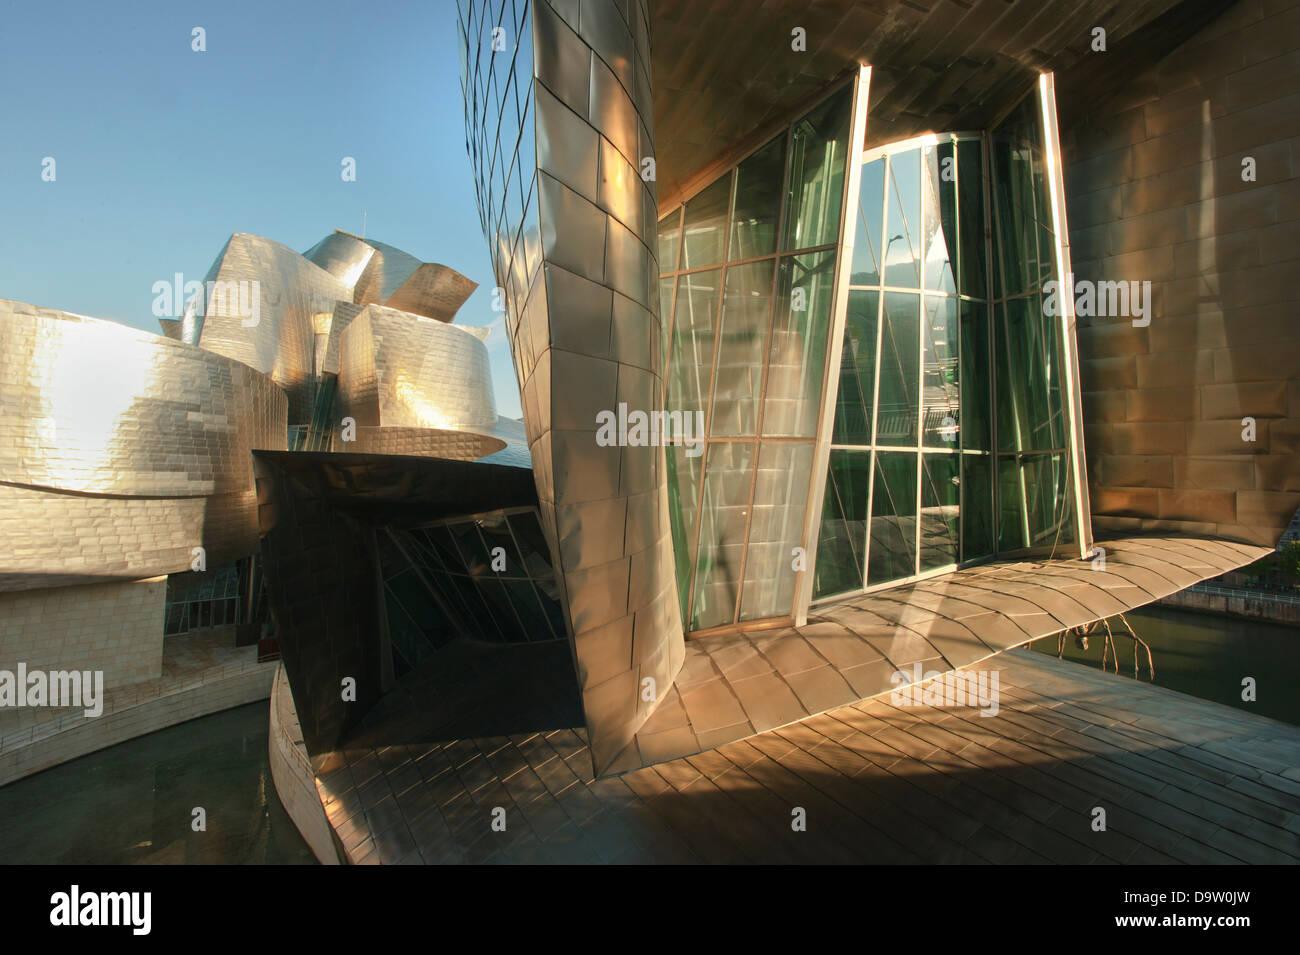 Guggenheim Museum, Bilbao, Espagne, Architecte: Frank Gehry Banque D'Images